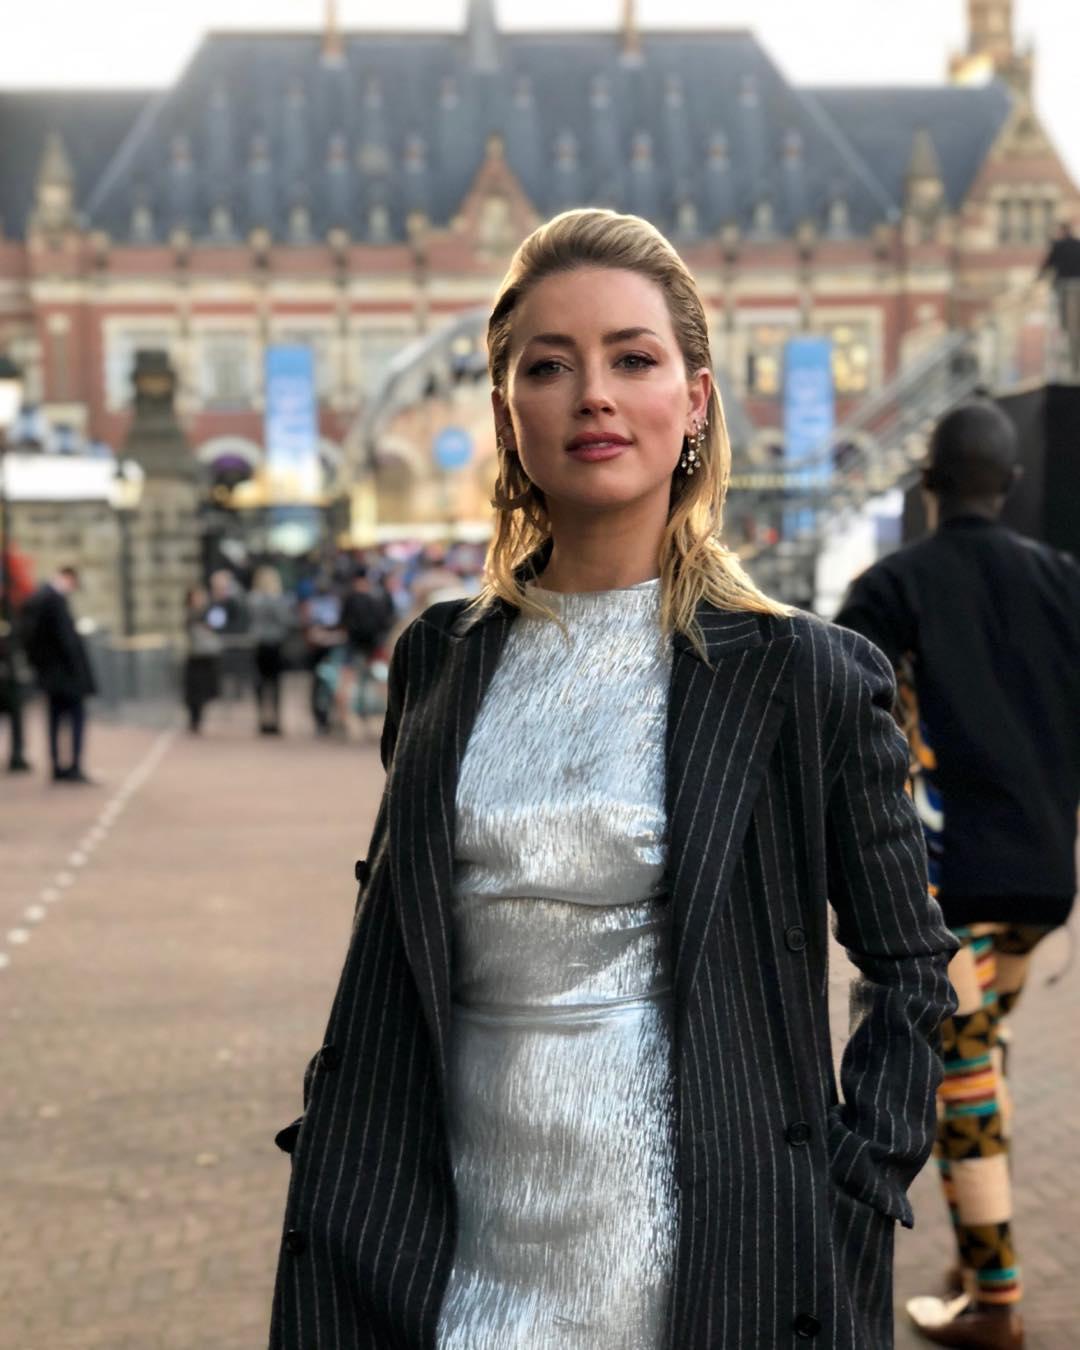 Amber Heard Photos | Amber Heard Pictures - HD Actress Photo